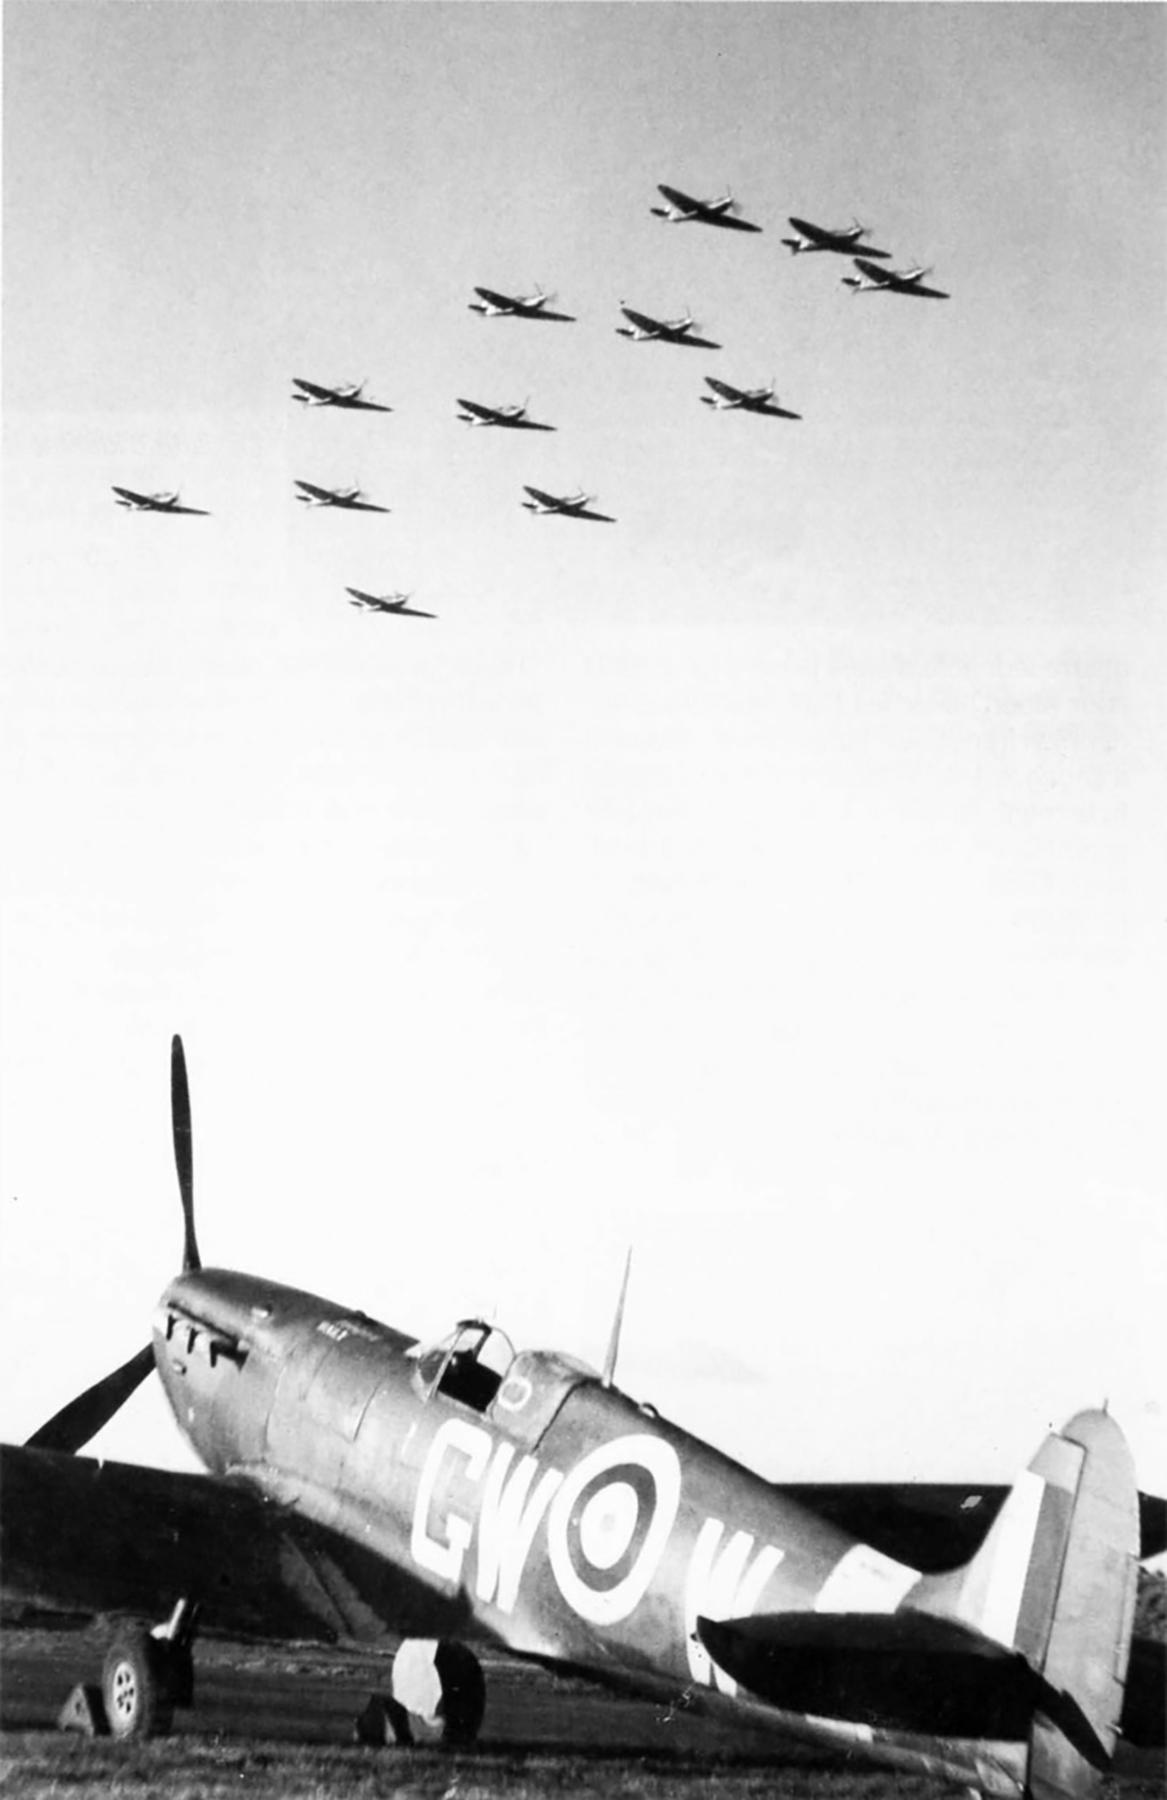 Spitfire MkVb RAF 340Sqn GWW Marcel Albert AR363 England June 1942 01